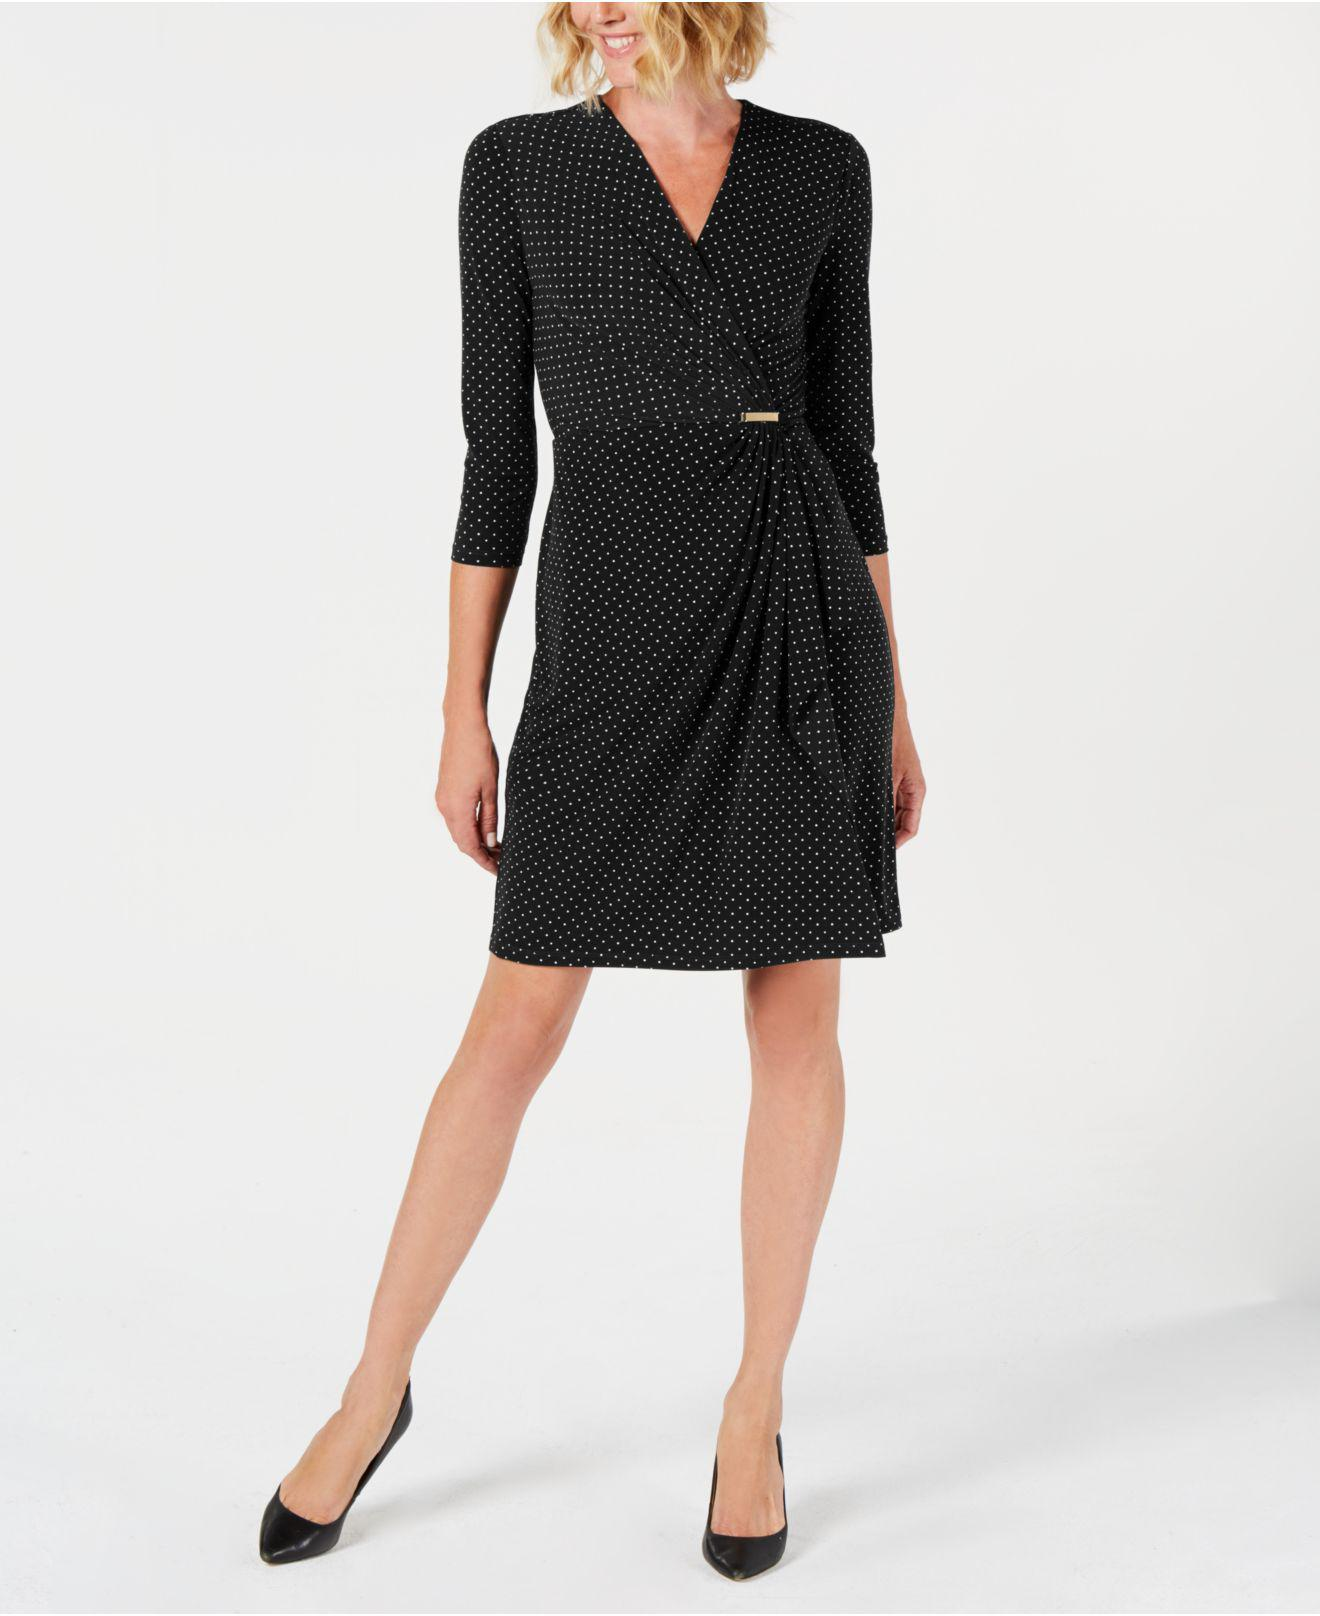 0603157ff98 Macys Formal Dresses Knee Length - Gomes Weine AG